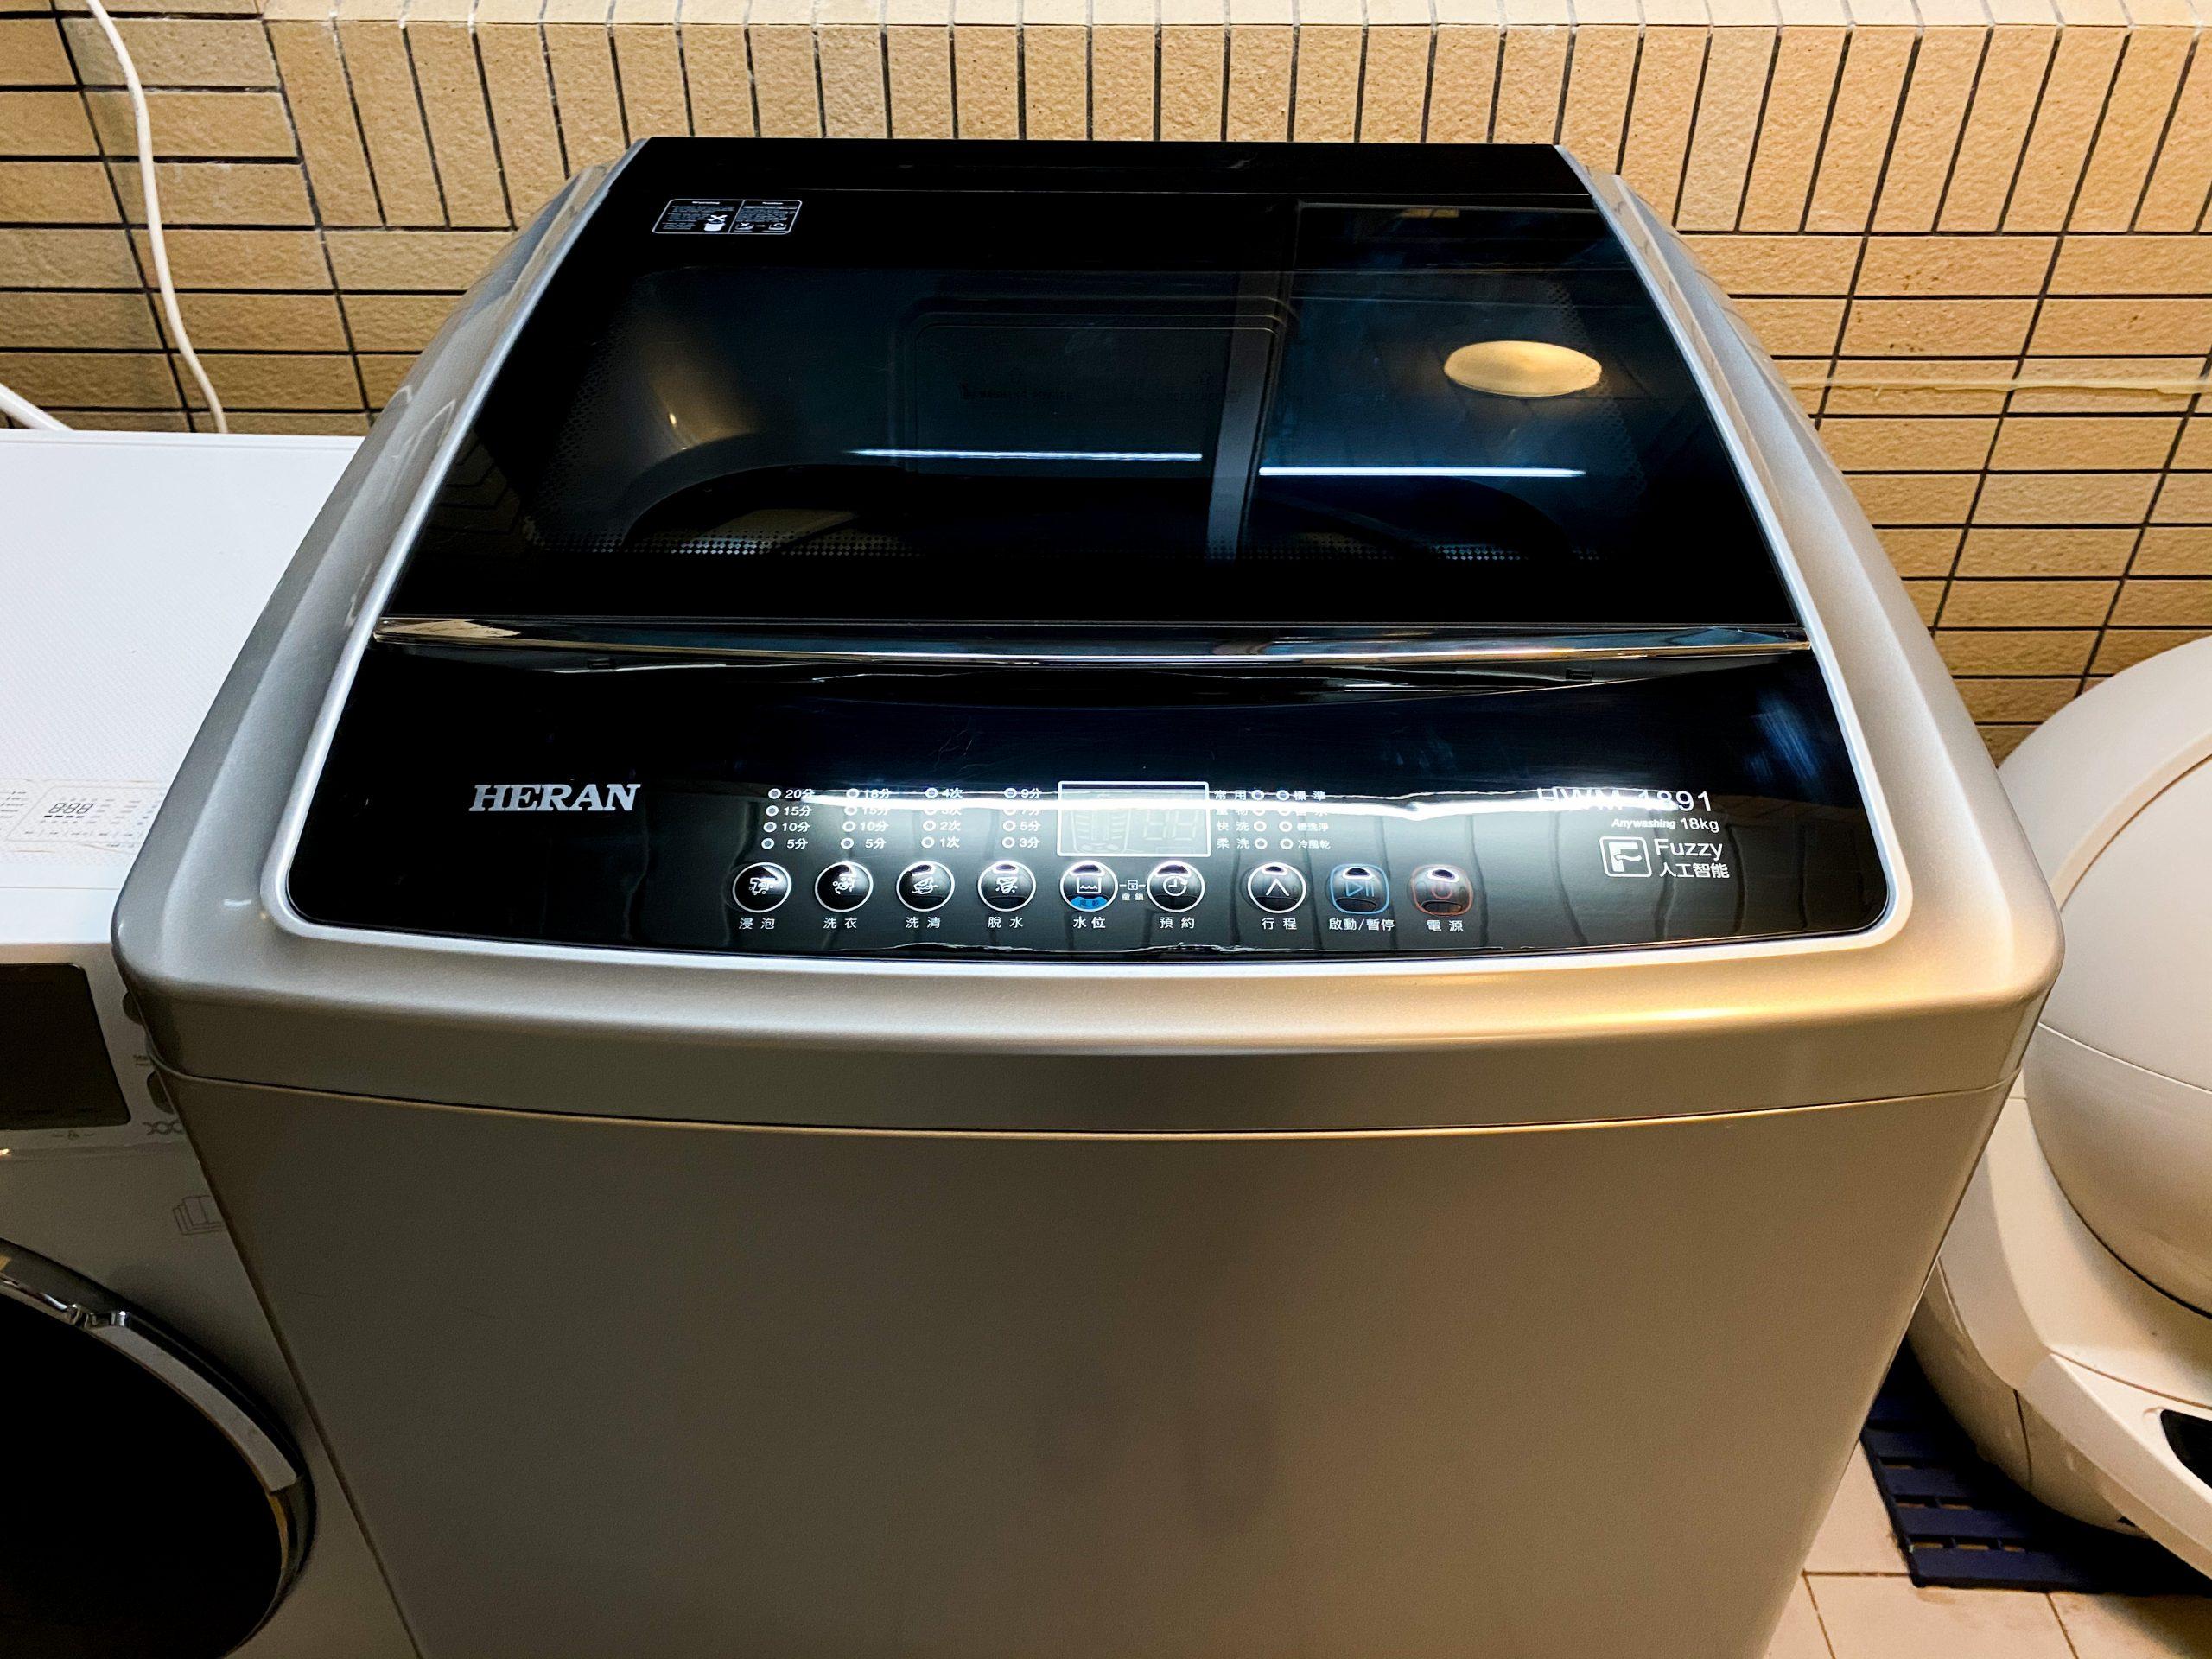 HERAN禾聯 ▌多道強勁水流的18公斤直立洗衣機!魔術濾網、槽洗淨、冷風乾 HWM-18ZDA10開箱心得